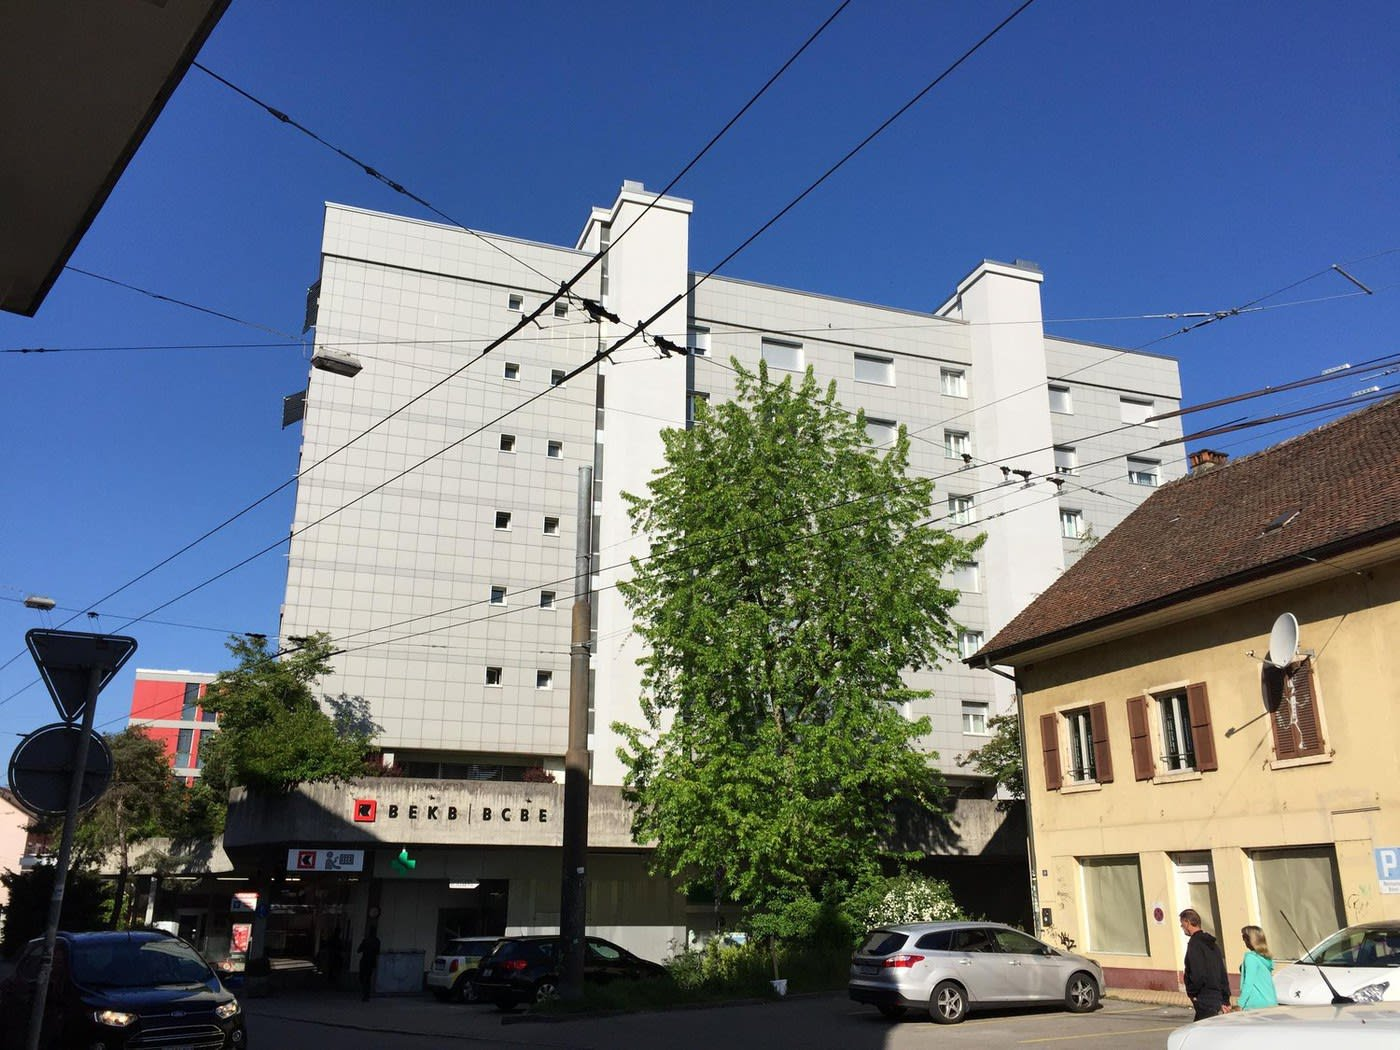 Poststrasse 17